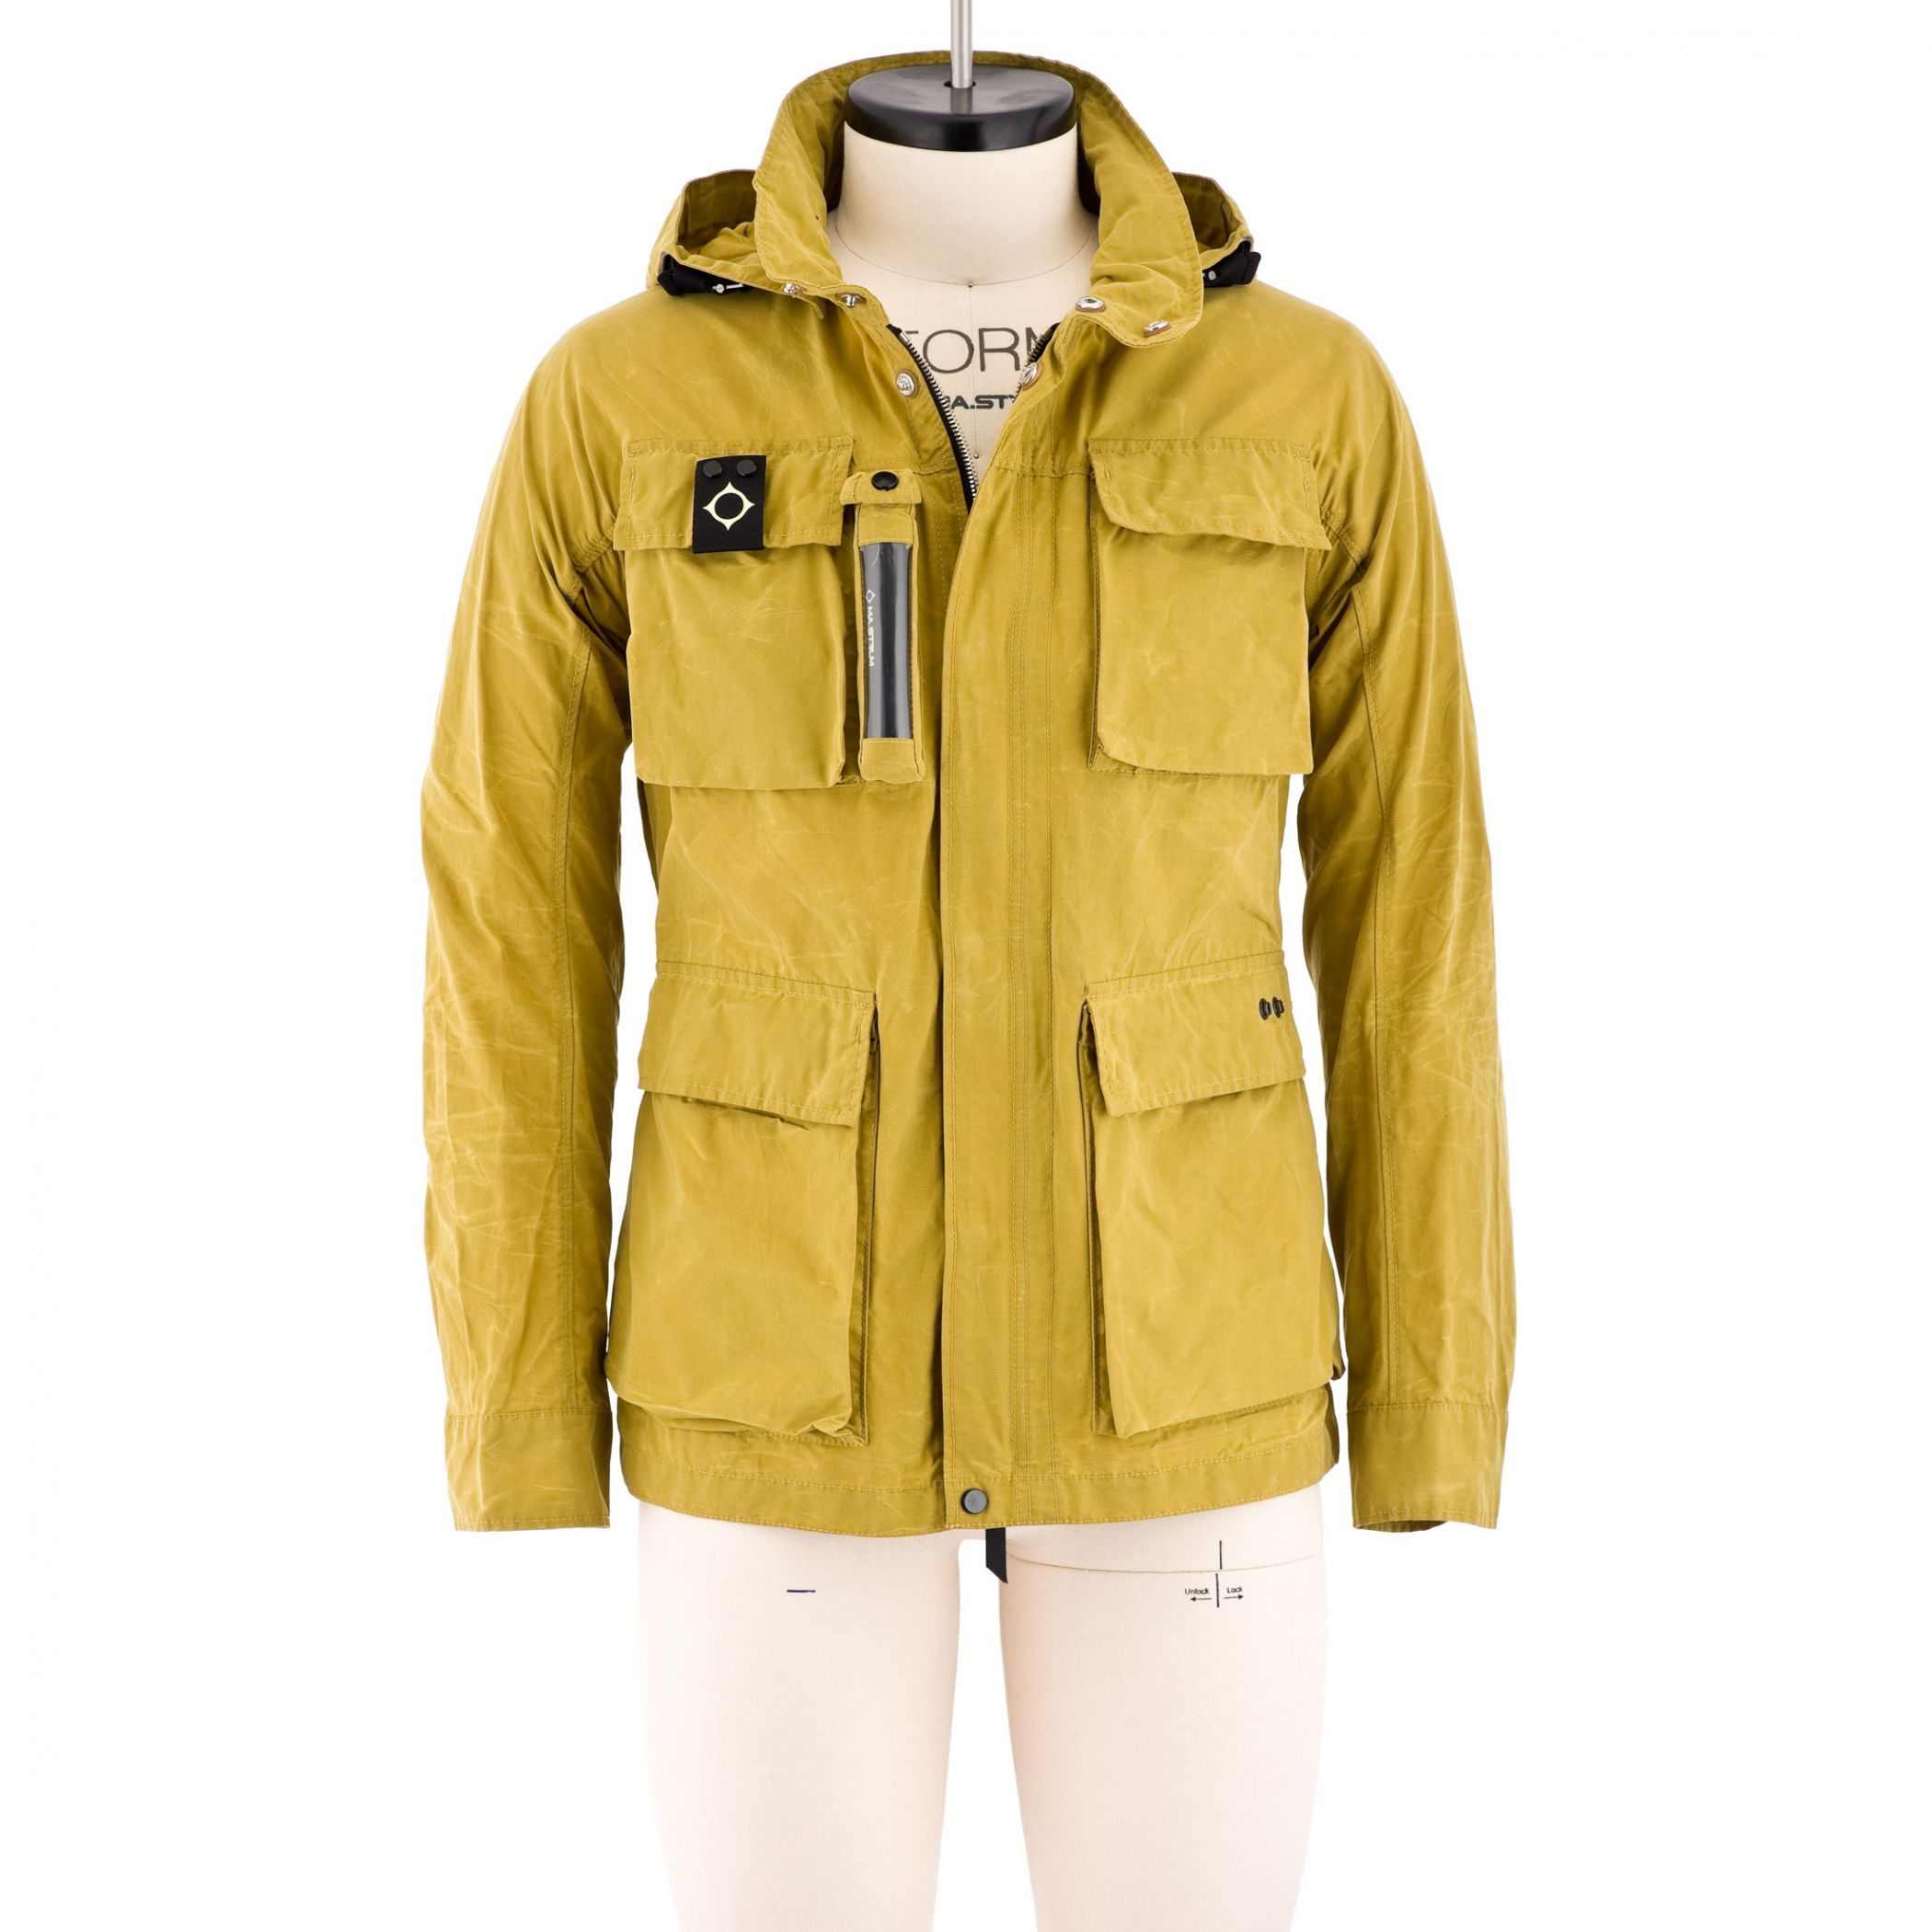 Drum major jacket fashion 17